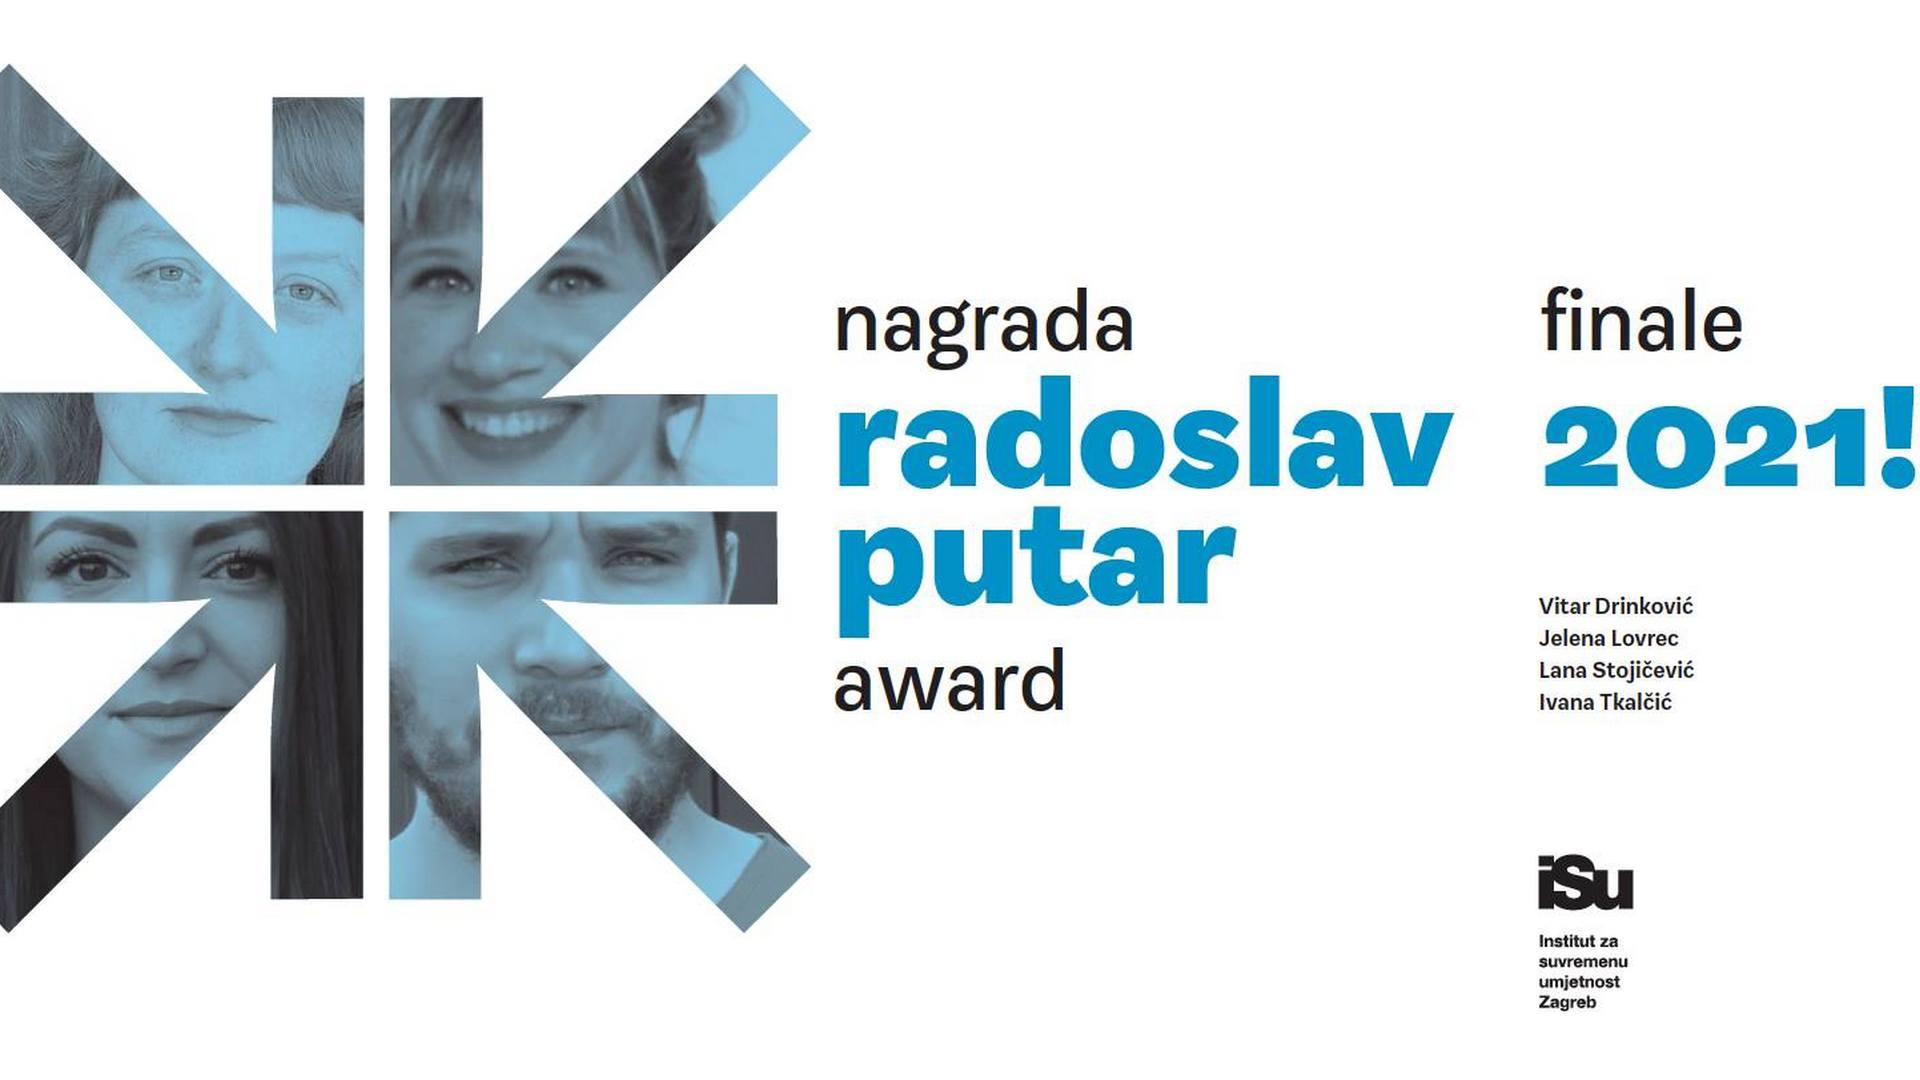 Nagrada Radoslav Putar Award   Finale 2021